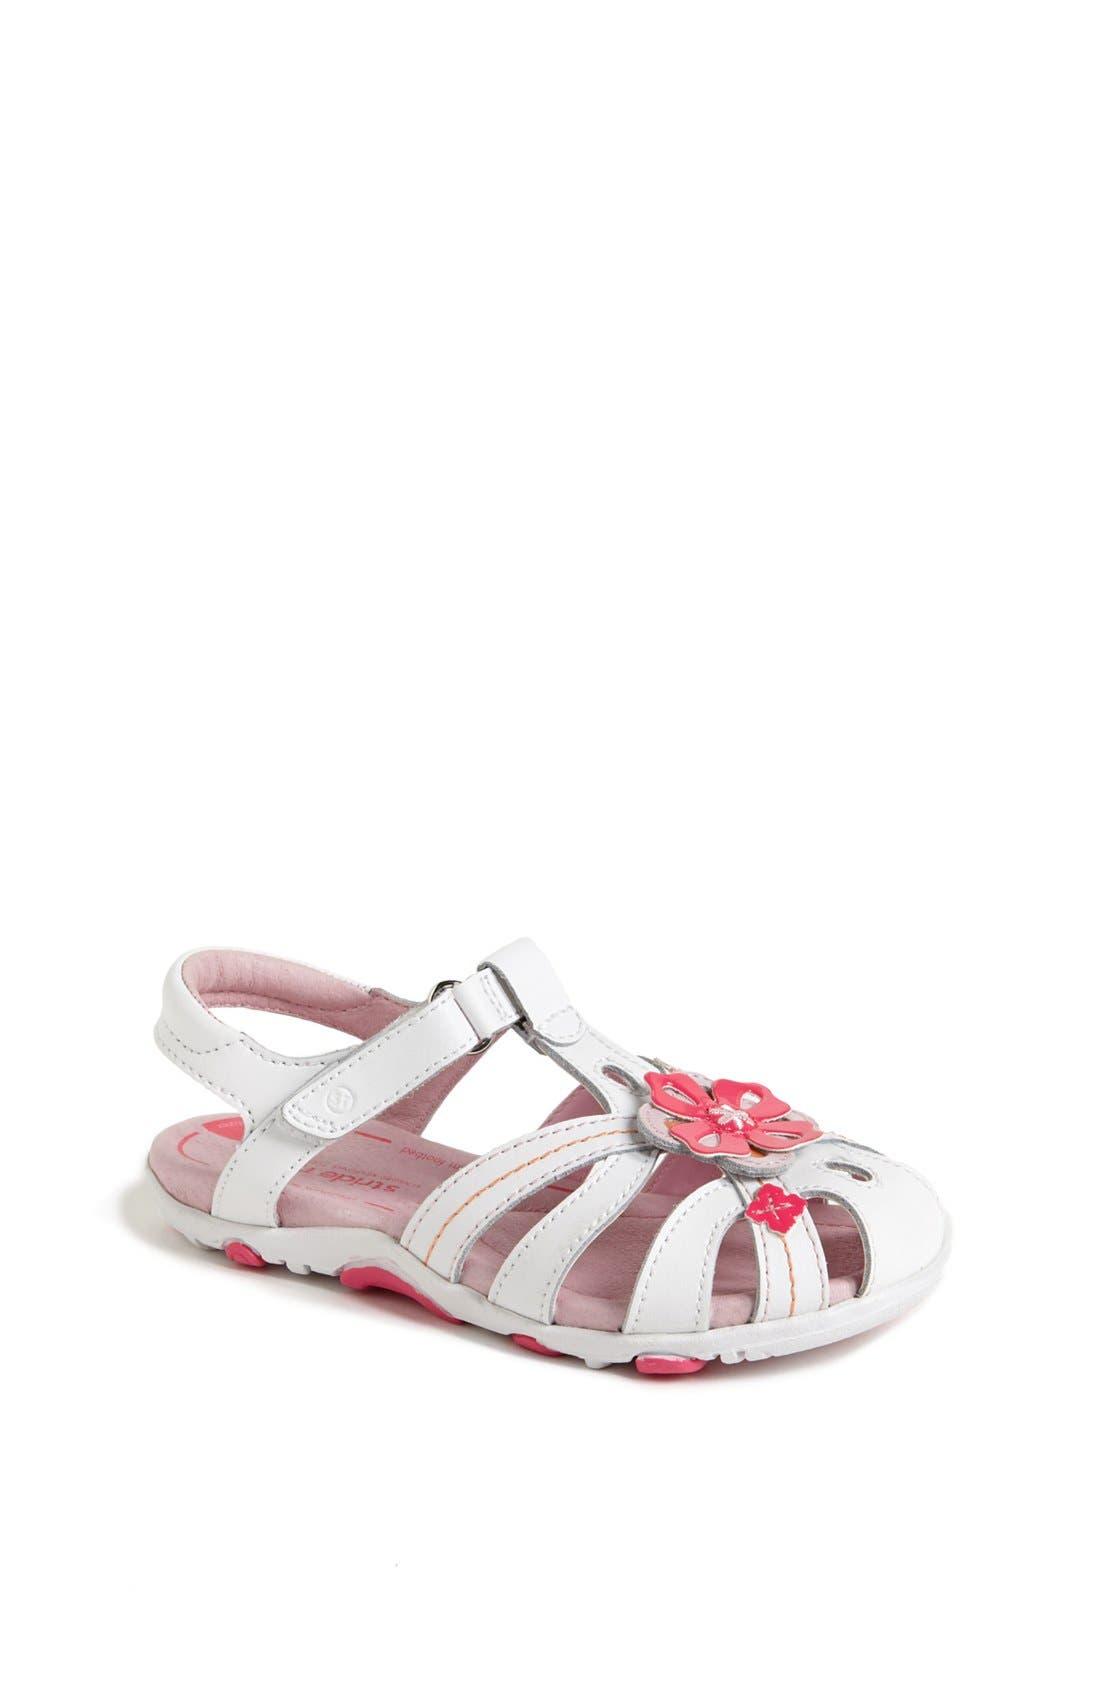 Alternate Image 1 Selected - Stride Rite 'Hazel' Sandal (Toddler & Little Kid)